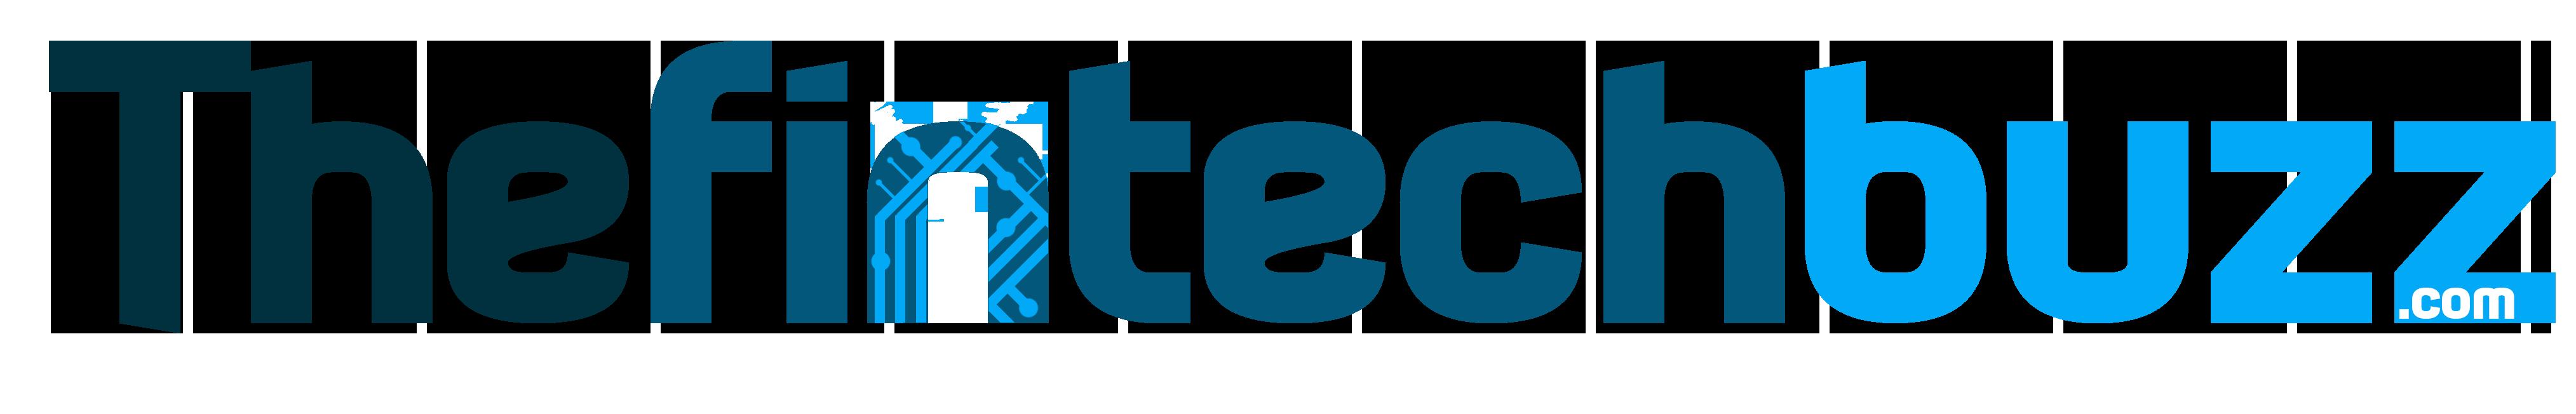 Thefintechbuzz